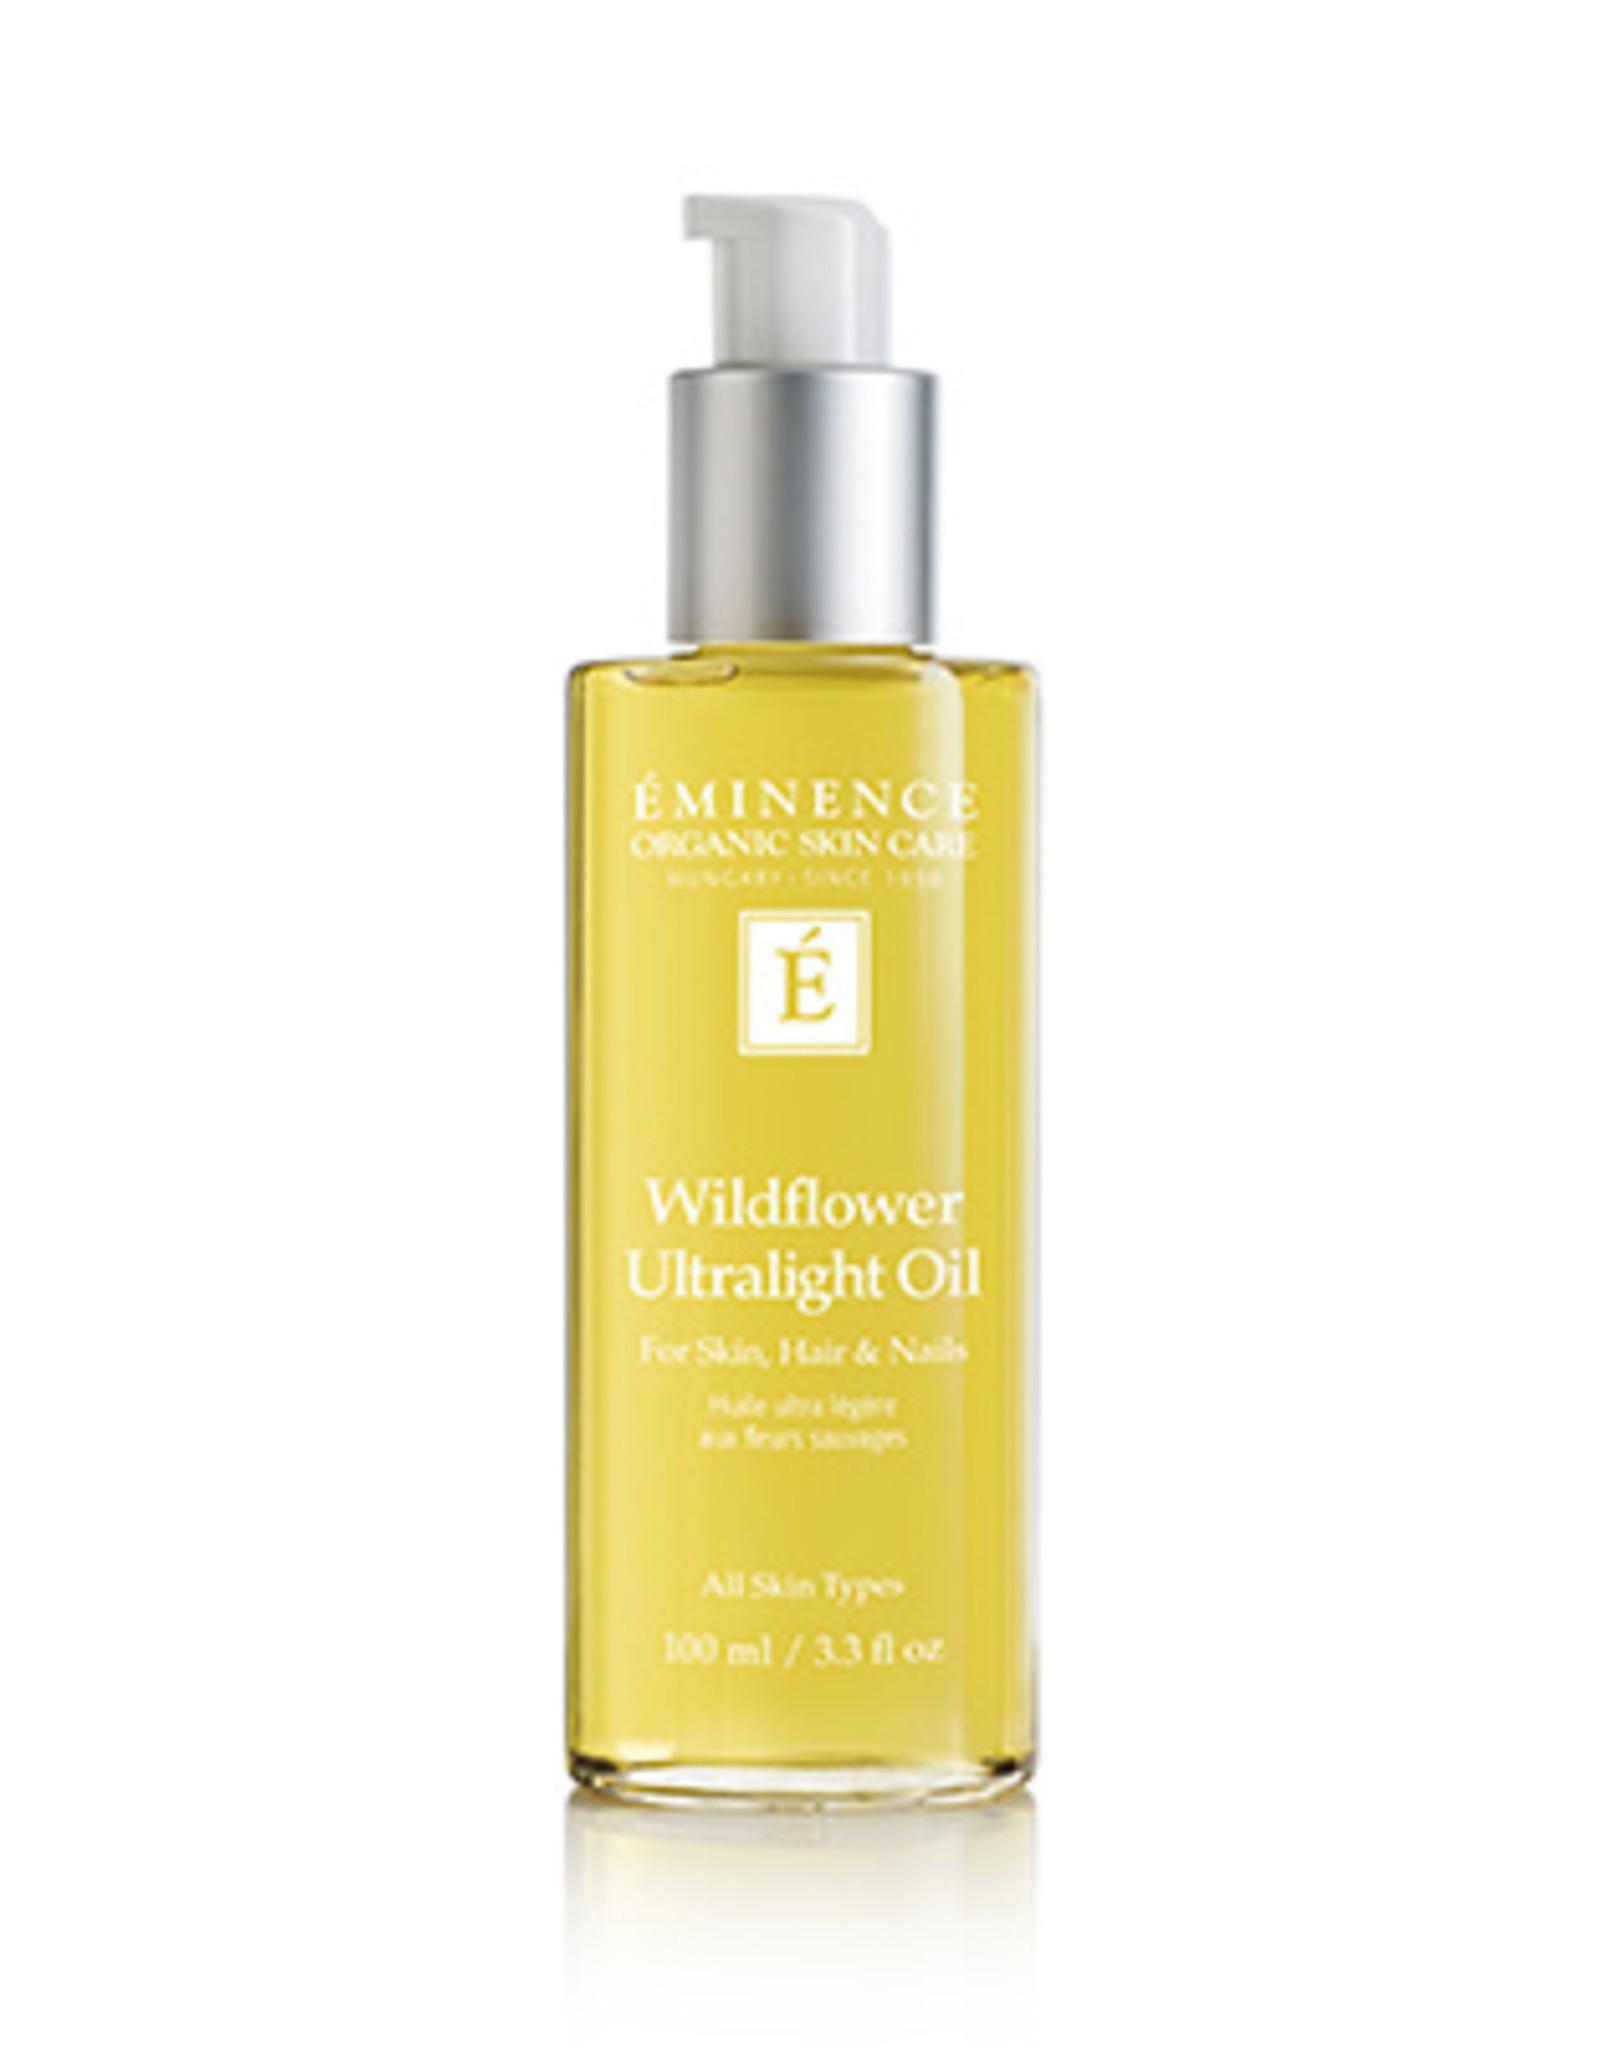 Eminence Organic Skin Care Wildflower Ultralight Oil